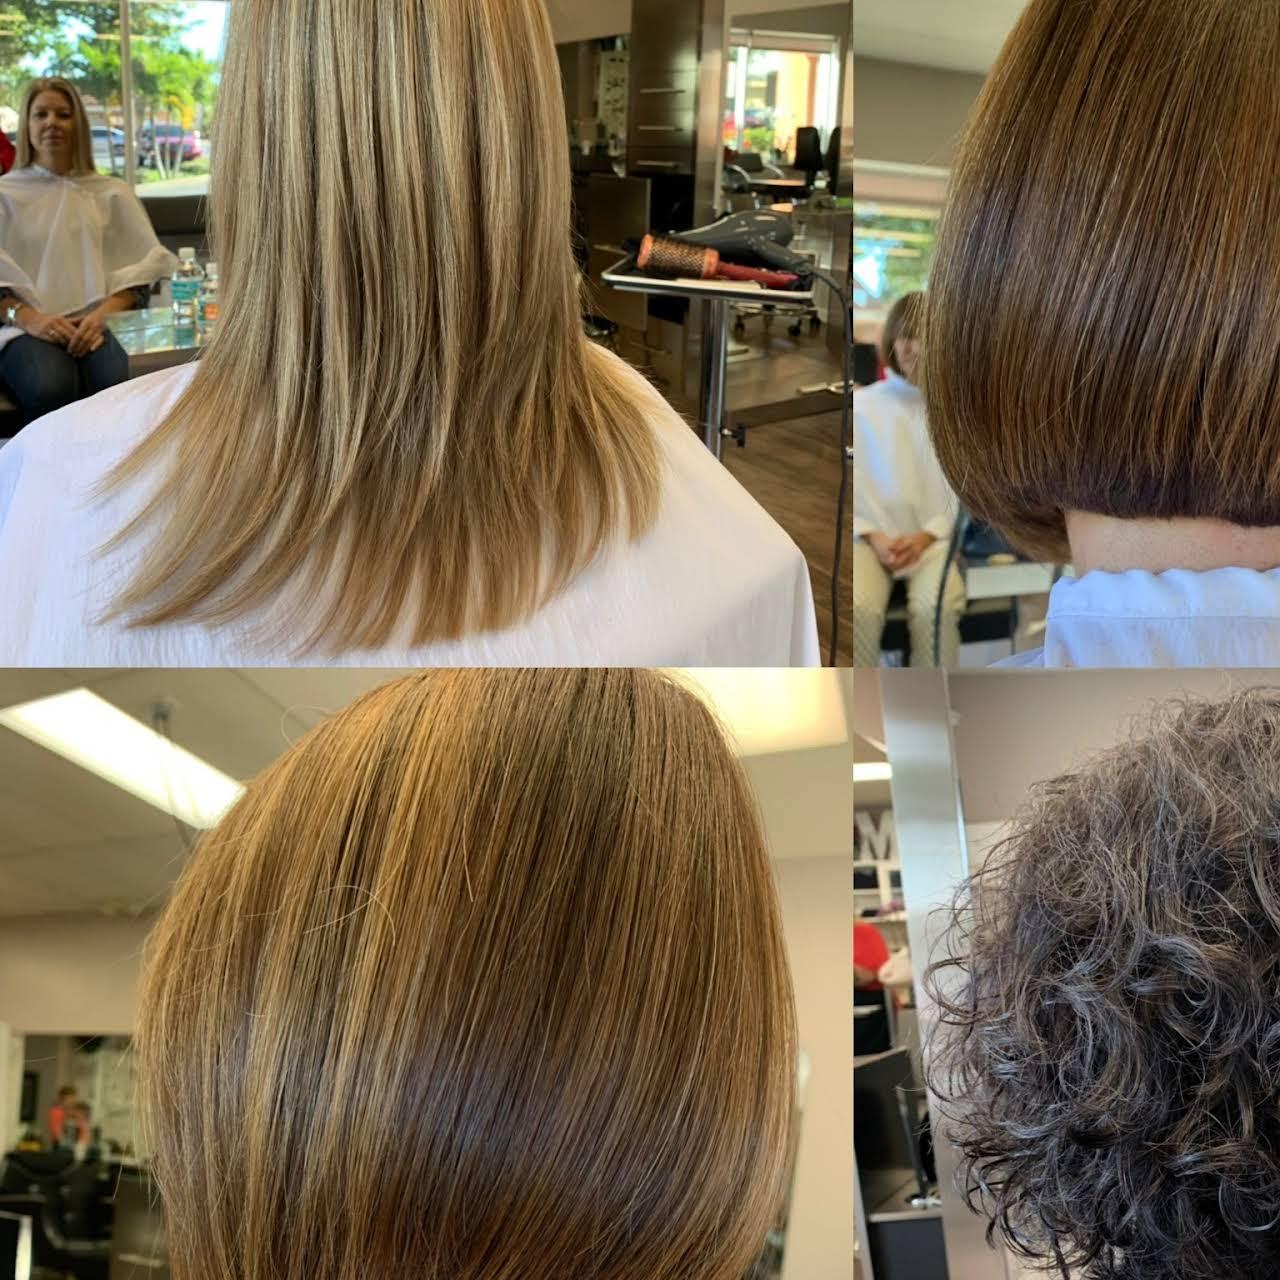 Mida H M Ouidad Certified Curly Hair Organic Color Salon Naples Fl Hair Salon In Naples